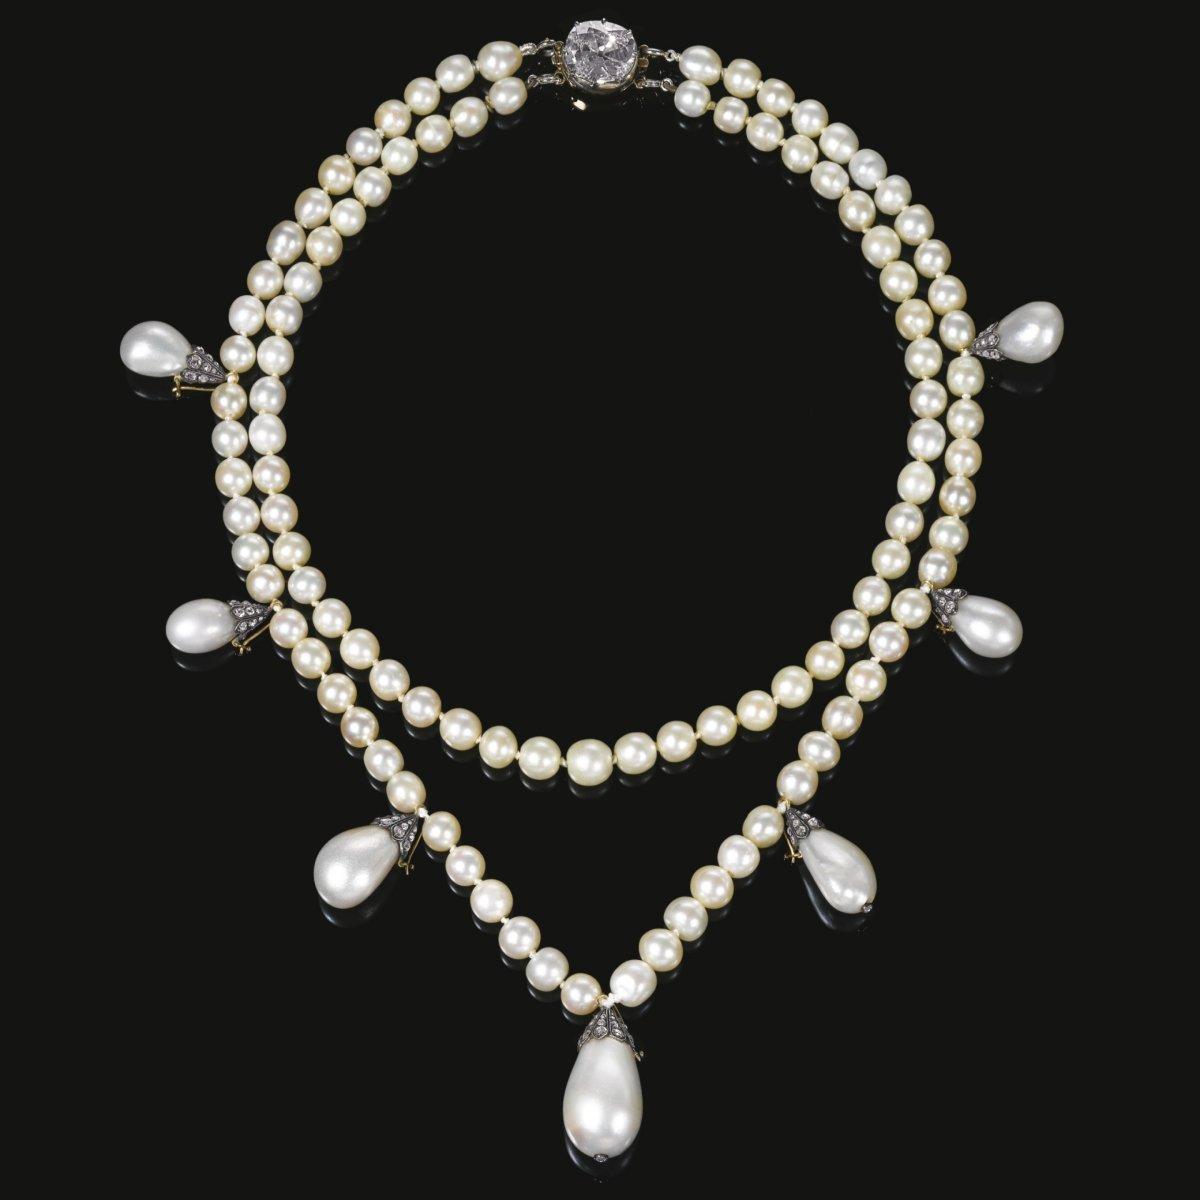 The Queen Joséphine Necklace